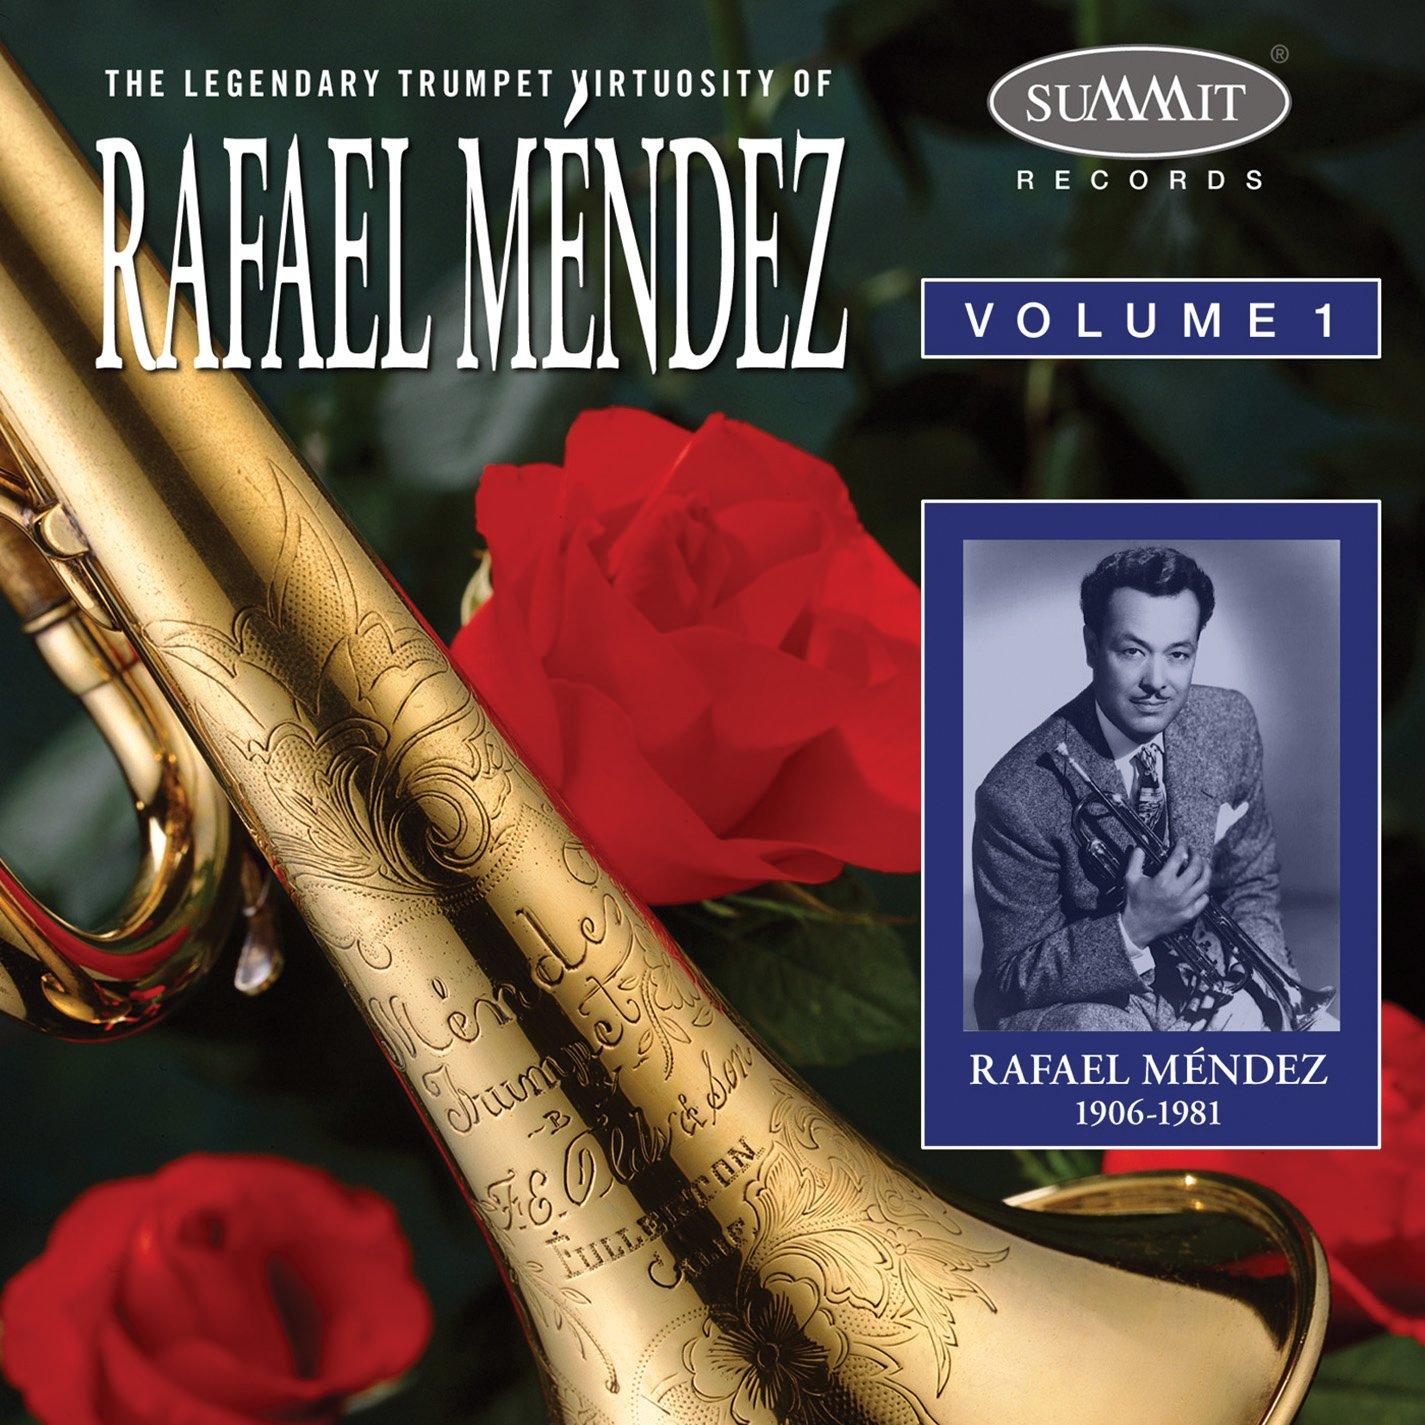 Legendary Trumpet Virtuosity of Rafael Mendez, Vol. 1 by Summit